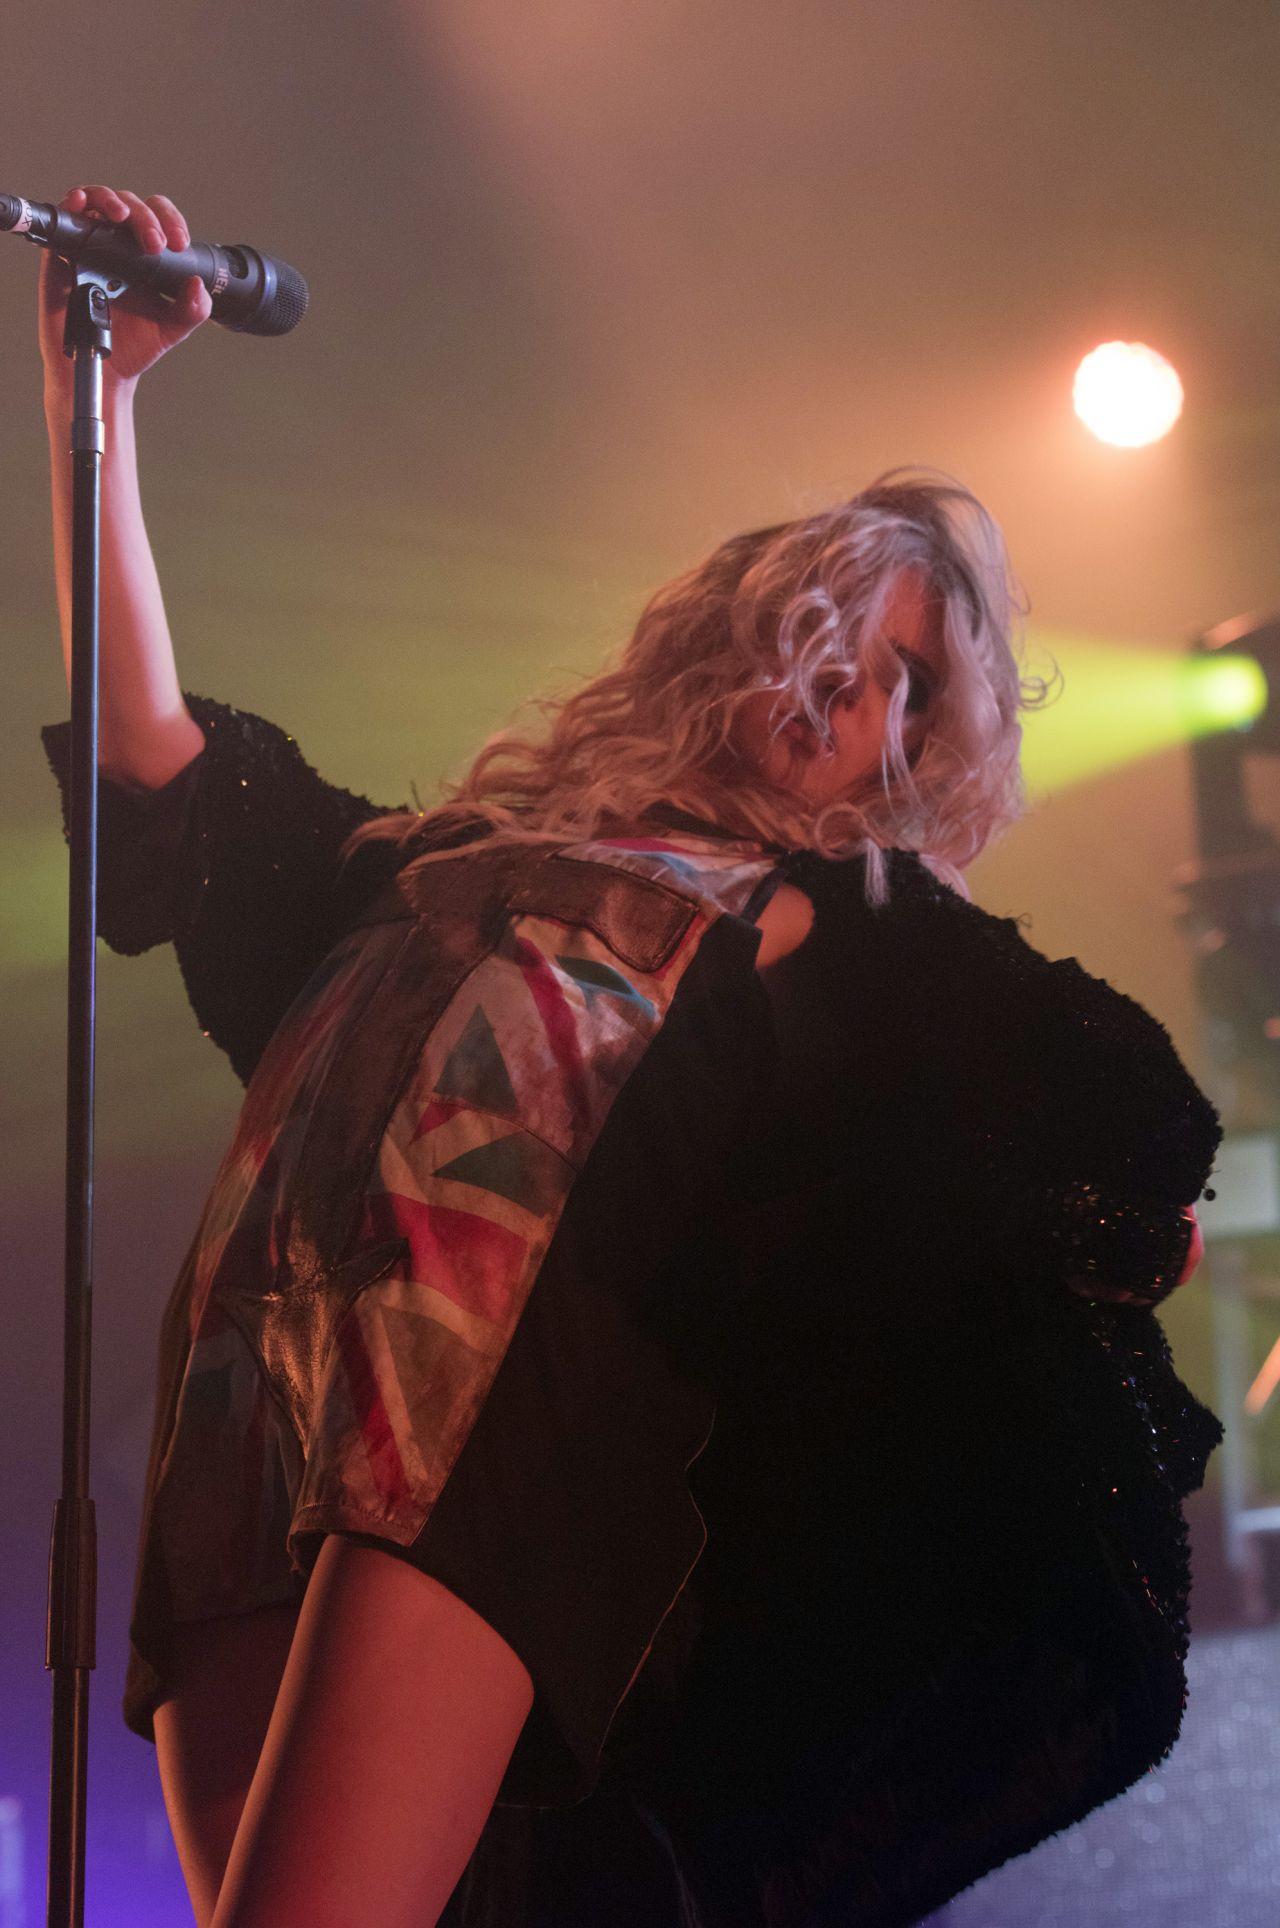 Taylor Momsen - Performing at Brixton Academy in London - November 2014